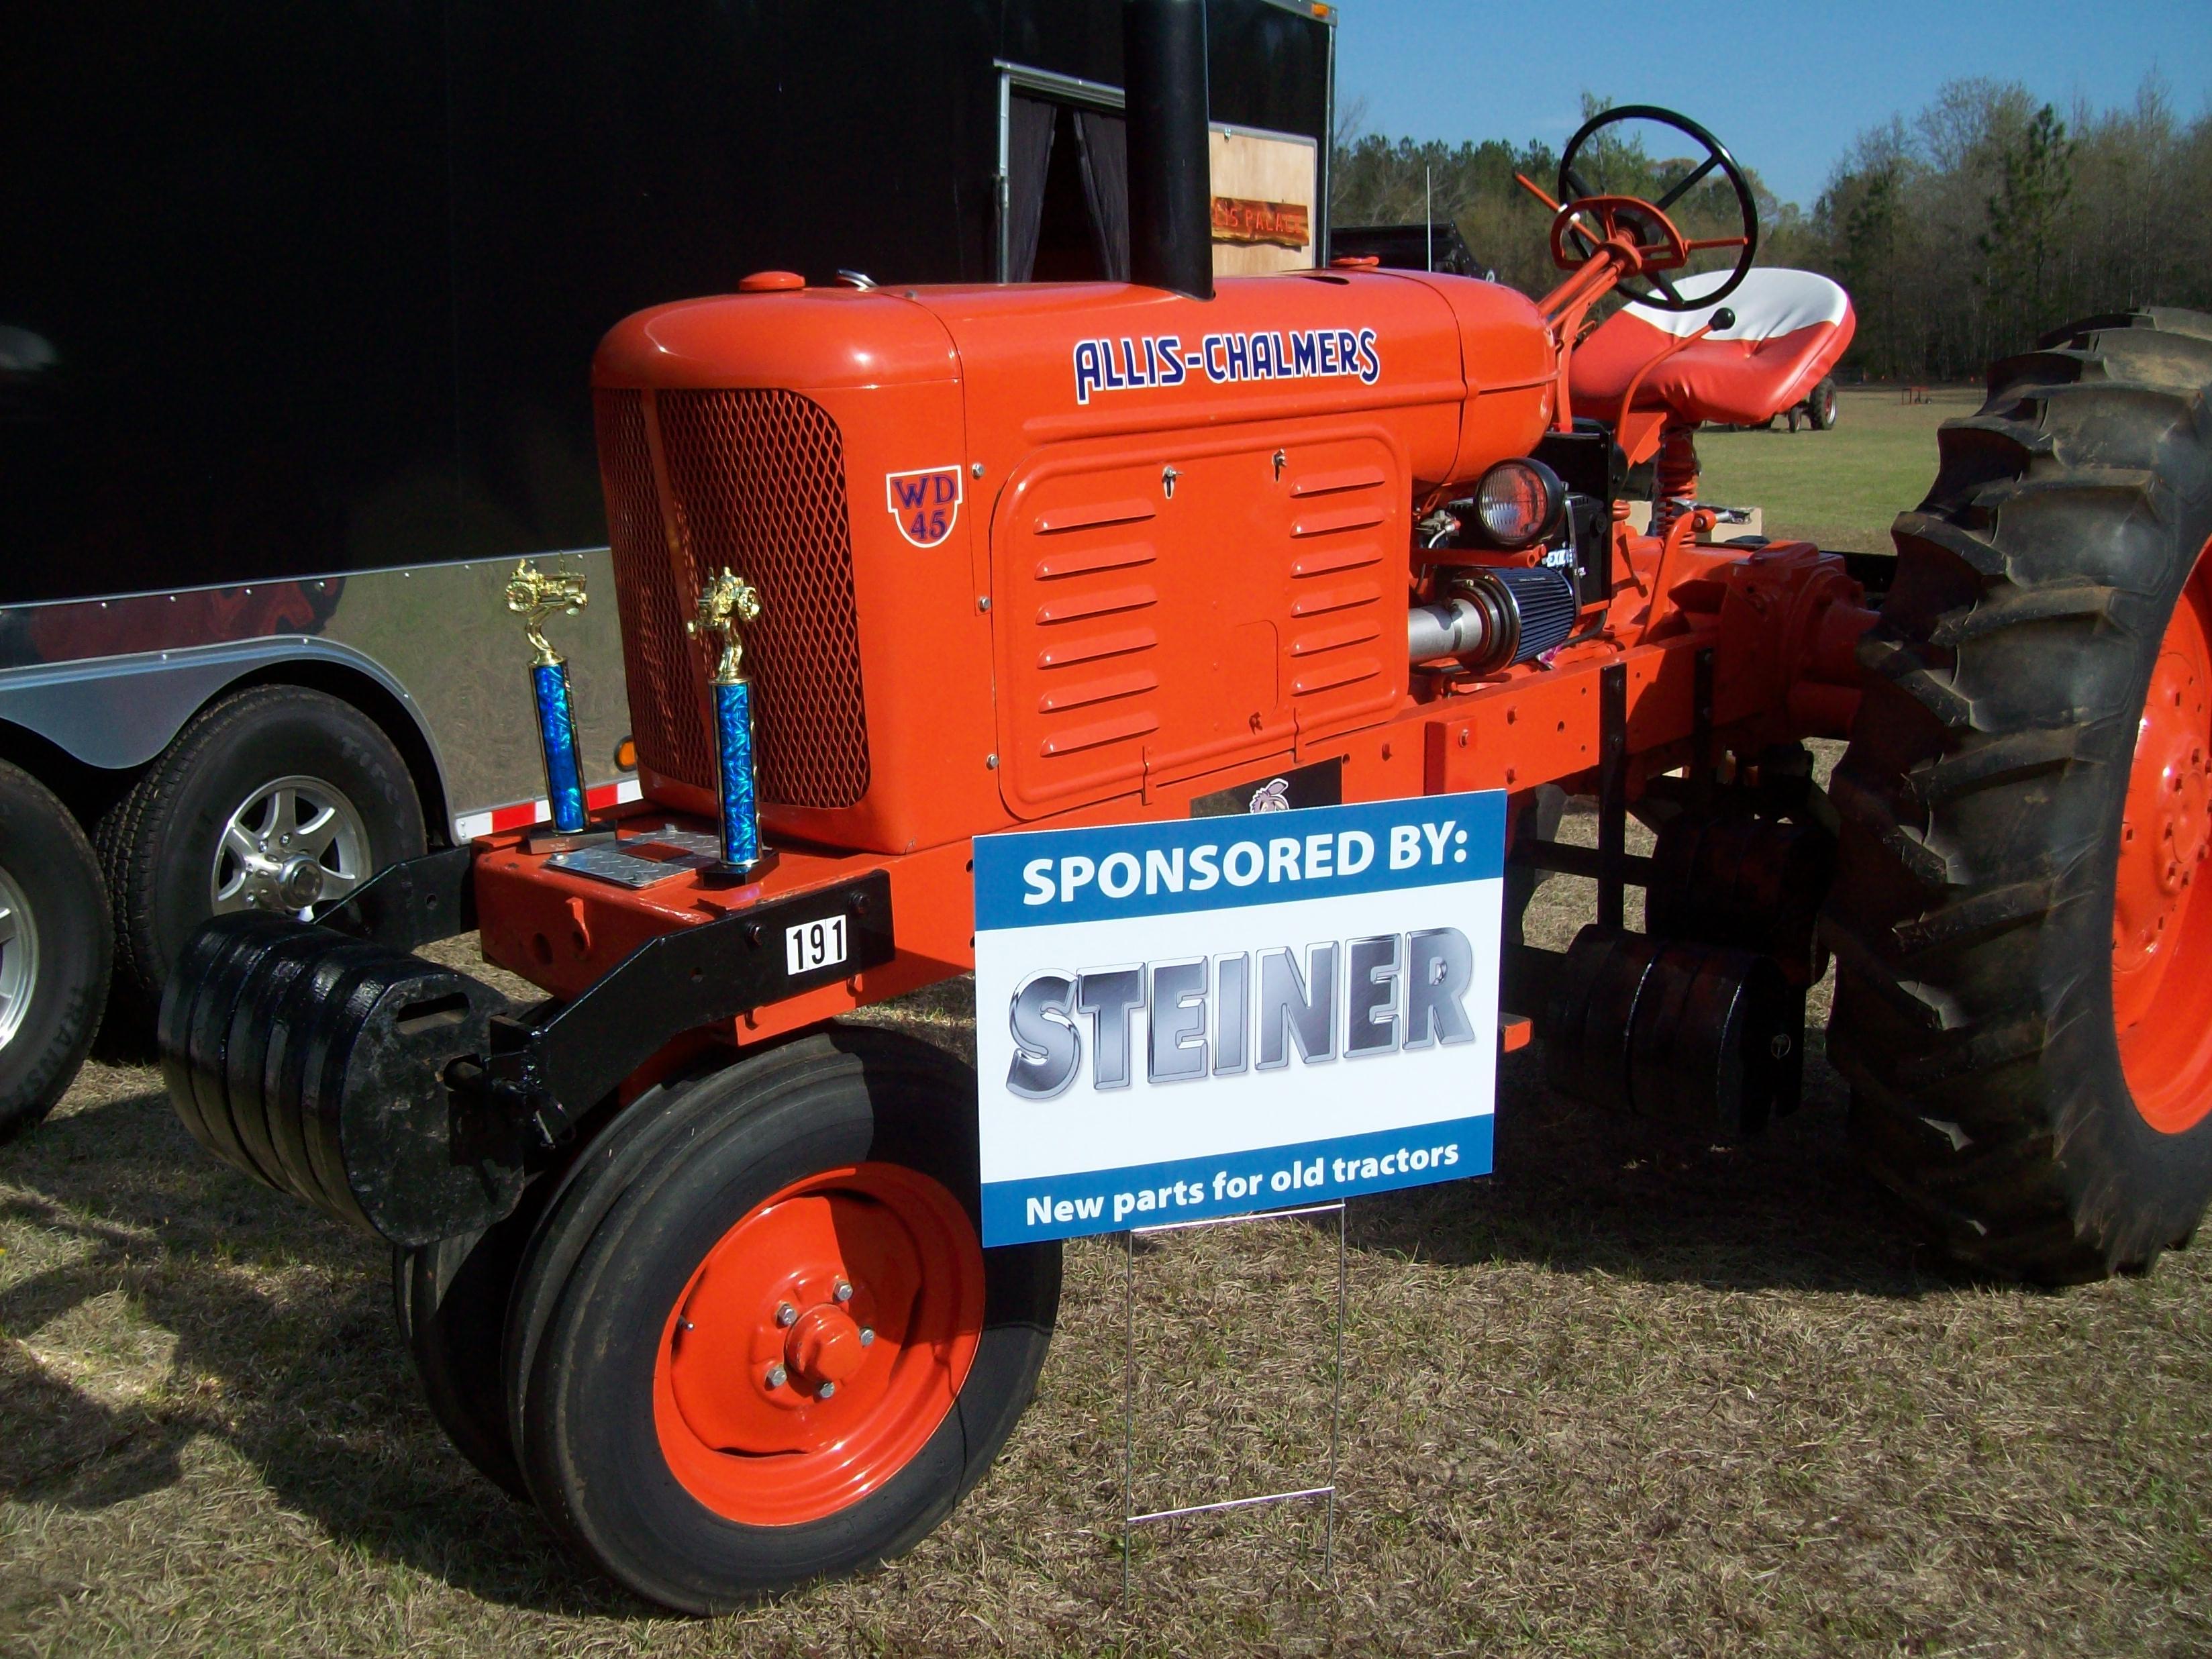 Tractor Pulling Parts : Tractor pulls st matthews antique